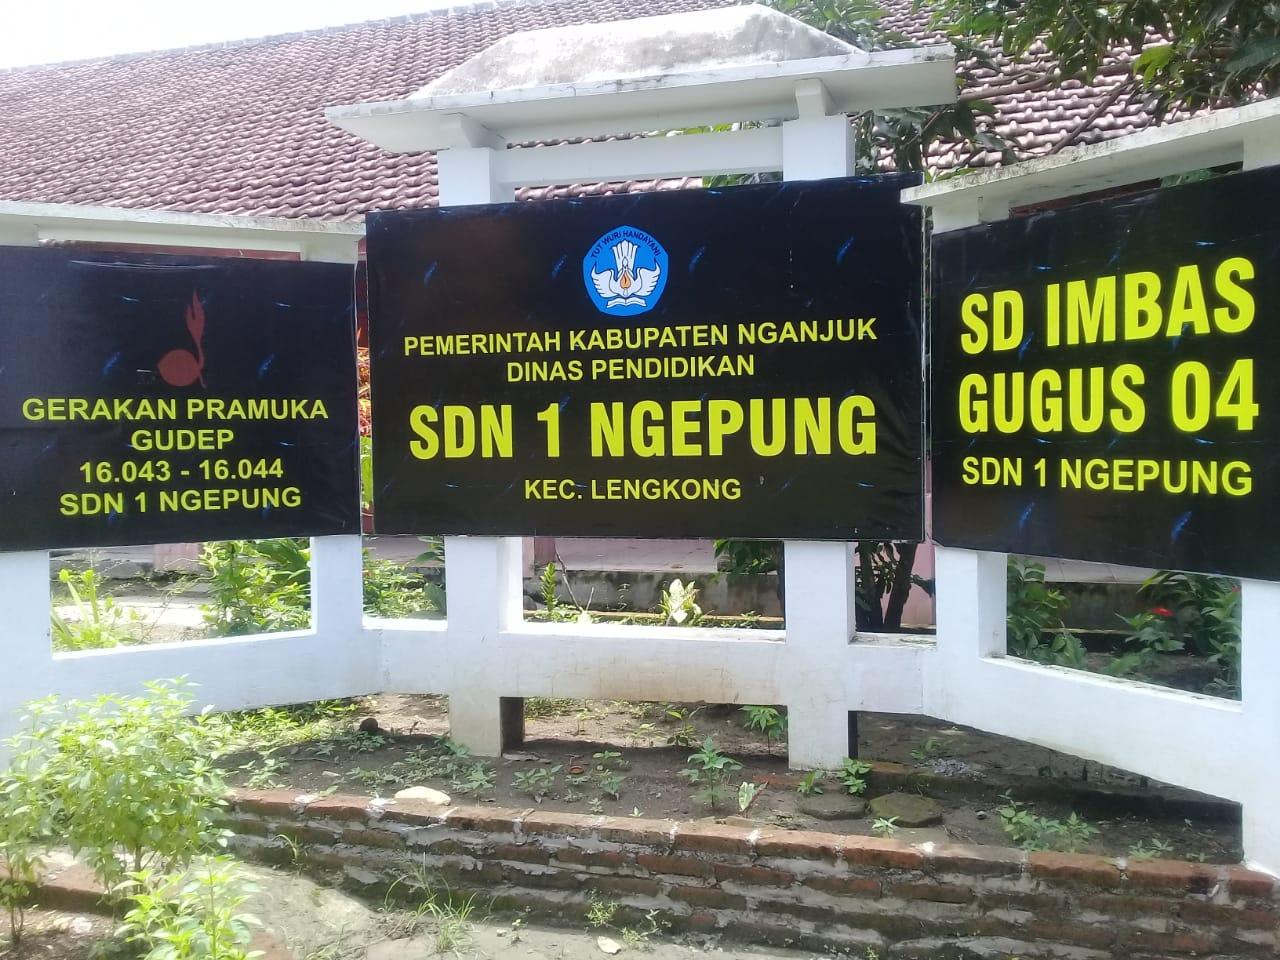 Miris Oknum Guru Sdn 1 Ngepung Lengkong Nganjuk Diduga Potong Dana Pip Siswa Sorot Nuswantoro News